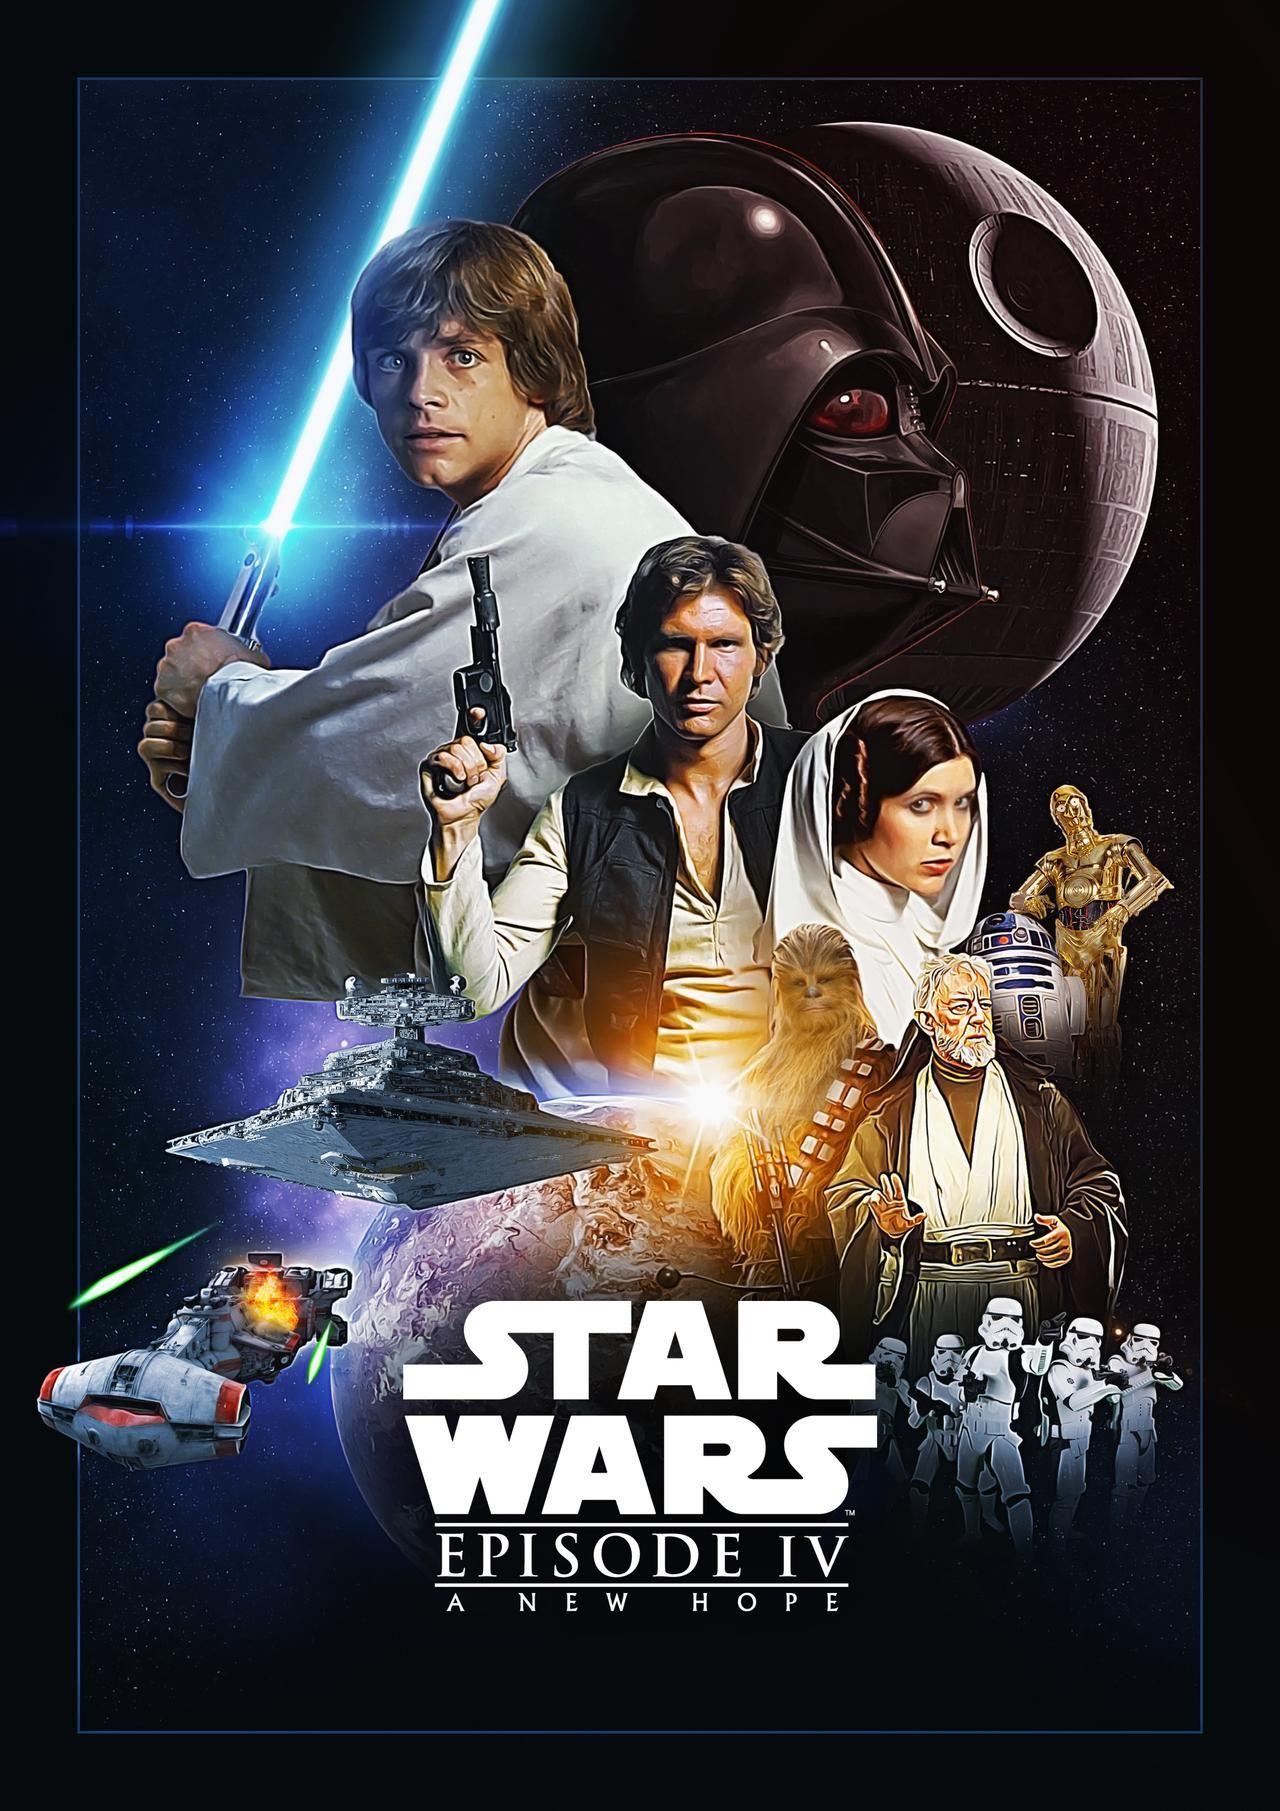 Star Wars: Episode 4 Fanart Poster by Uebelator on DeviantArt